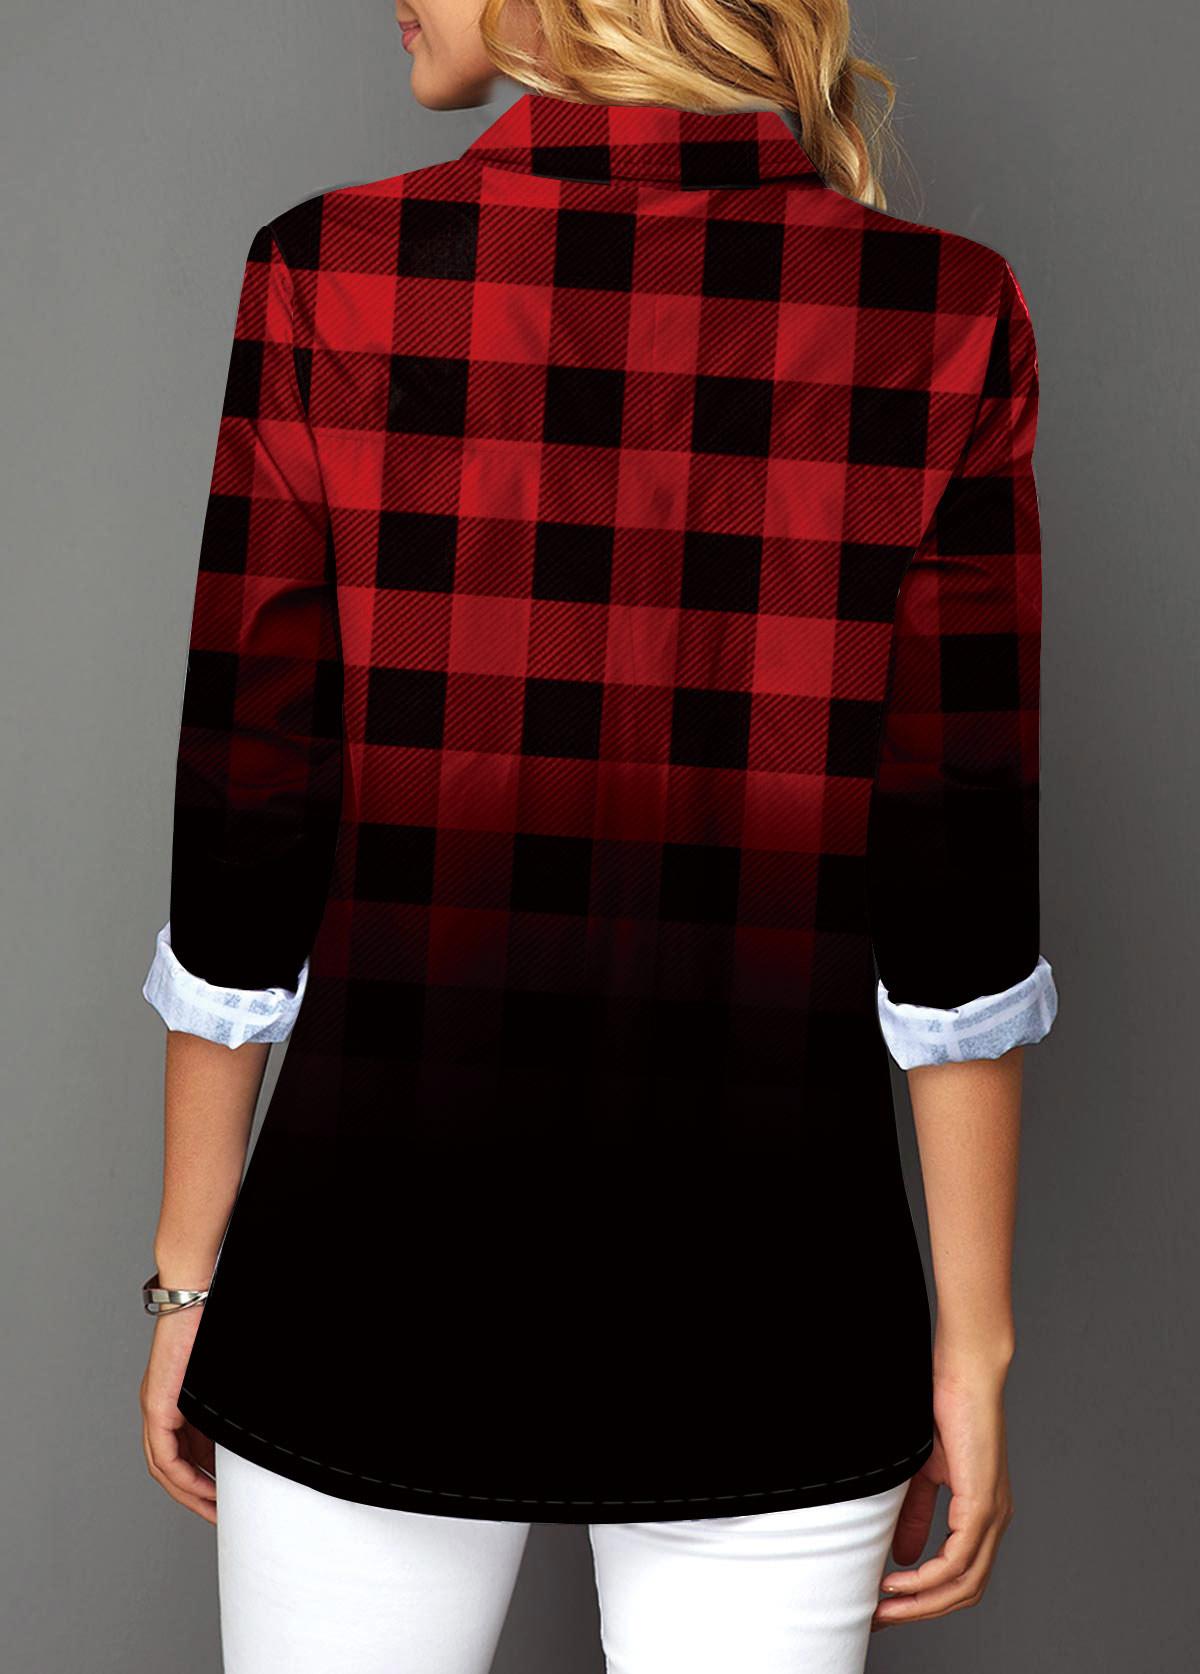 Button Up Plaid Print Turndown Collar Christmas Shirt